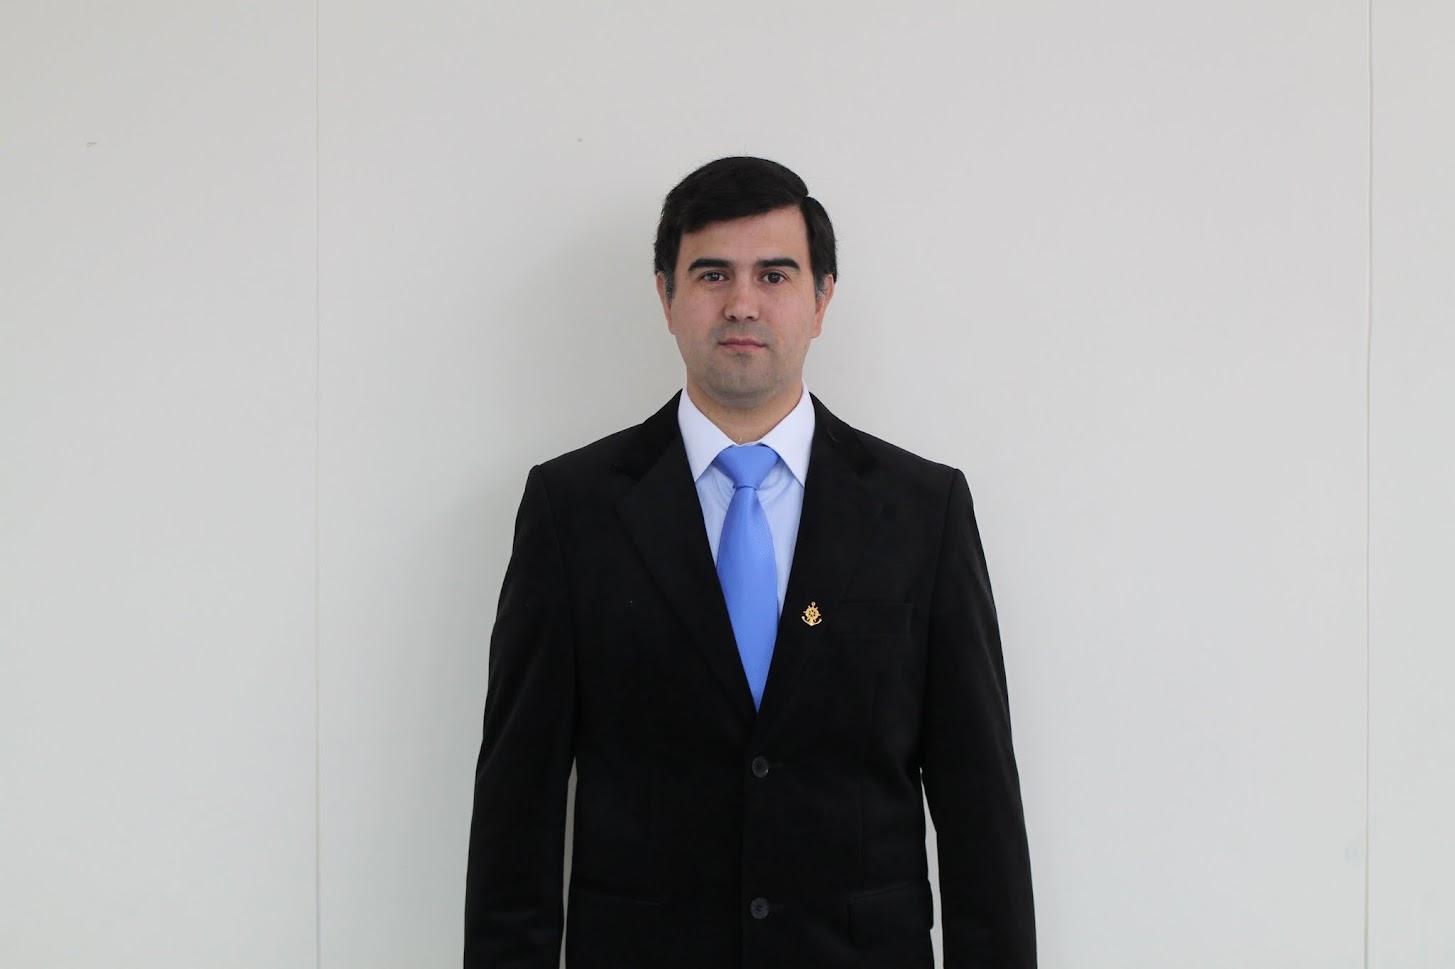 Marcelo Saldivia Andrade